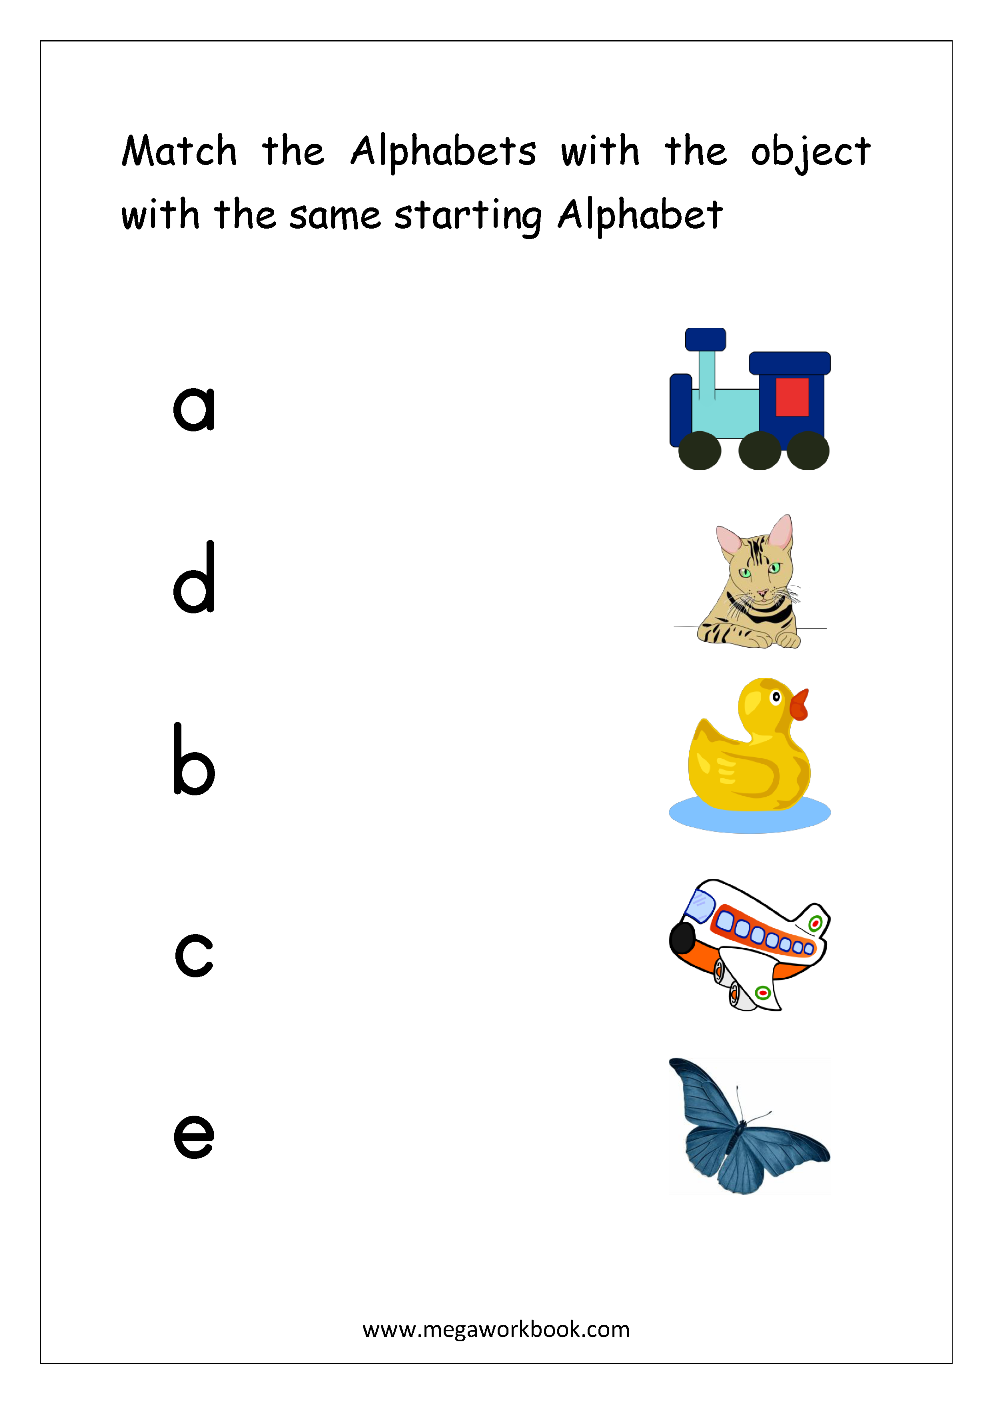 Free English Worksheets - Alphabet Matching - Megaworkbook for Alphabet Worksheets Matching